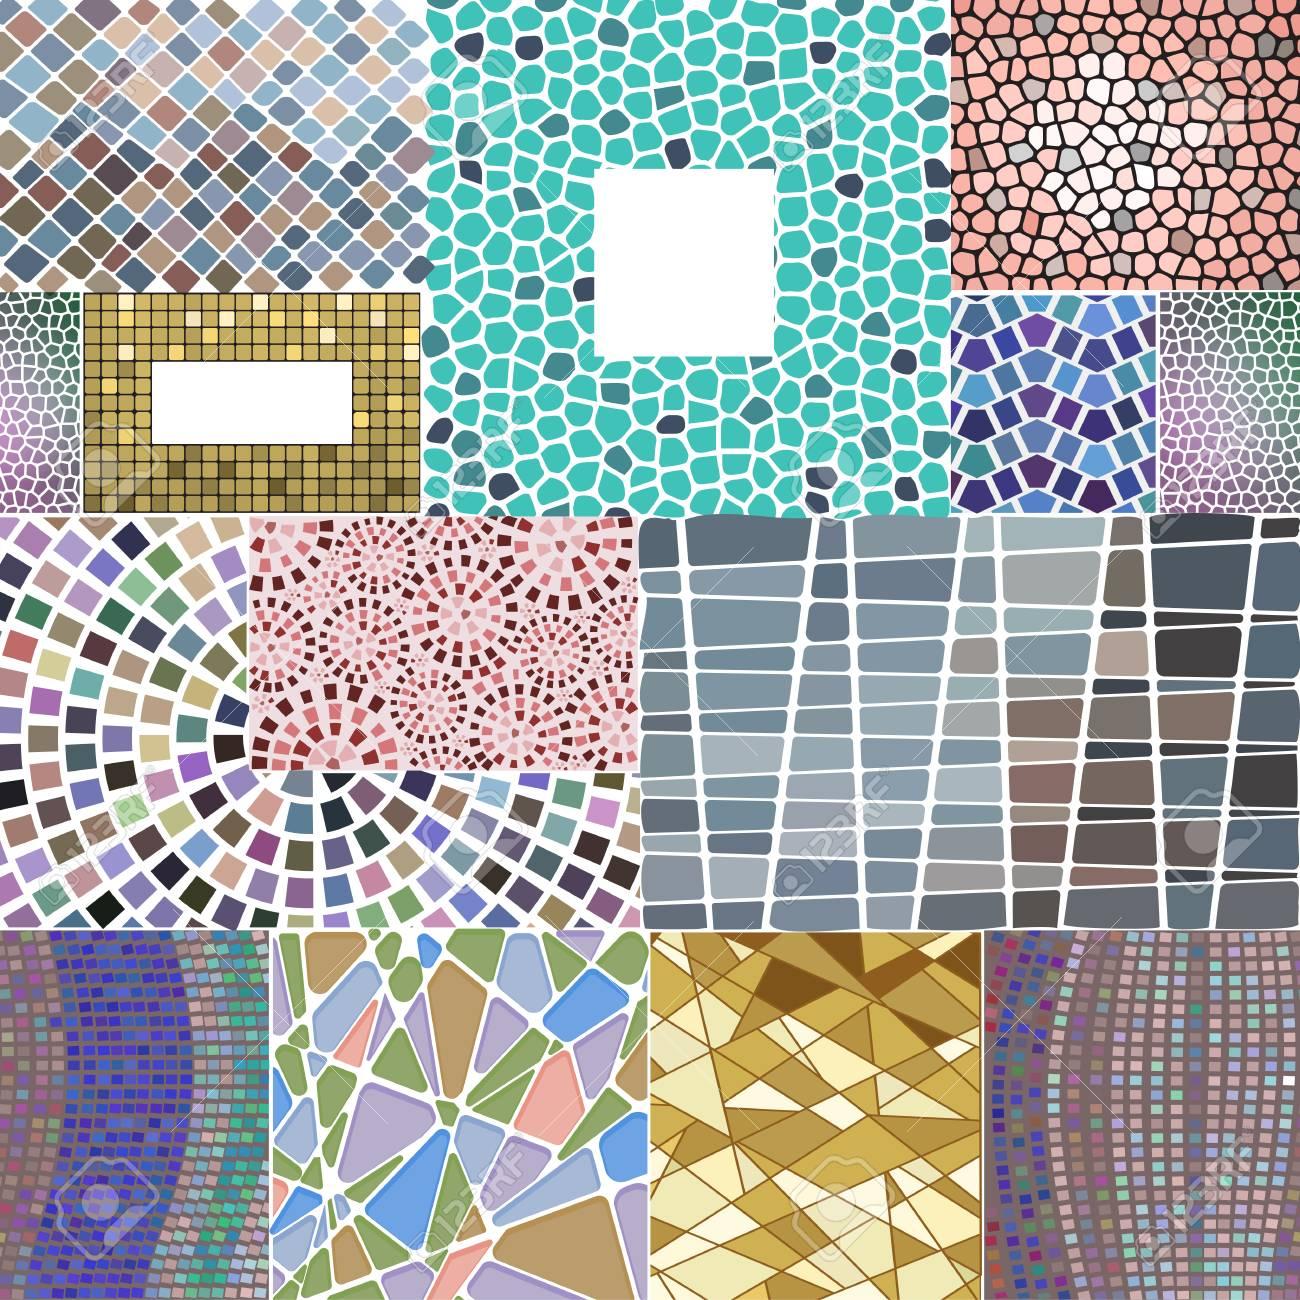 Mosaic Decoration Frames Patchwork Traditional Design Geometric ...